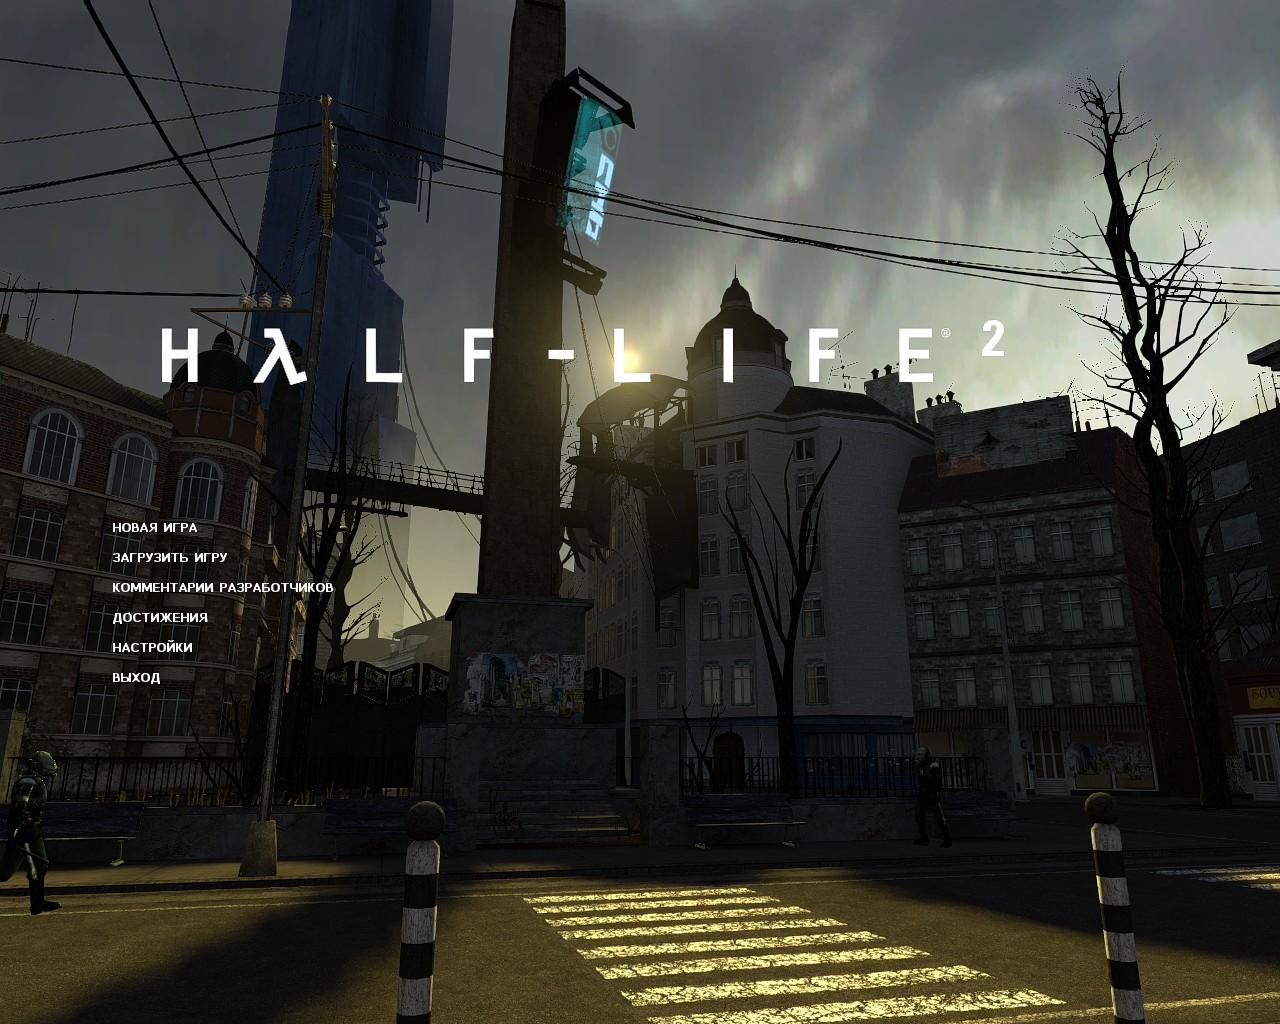 hl2 2014-04-12 21-23-10-70.jpg - Half-Life 2